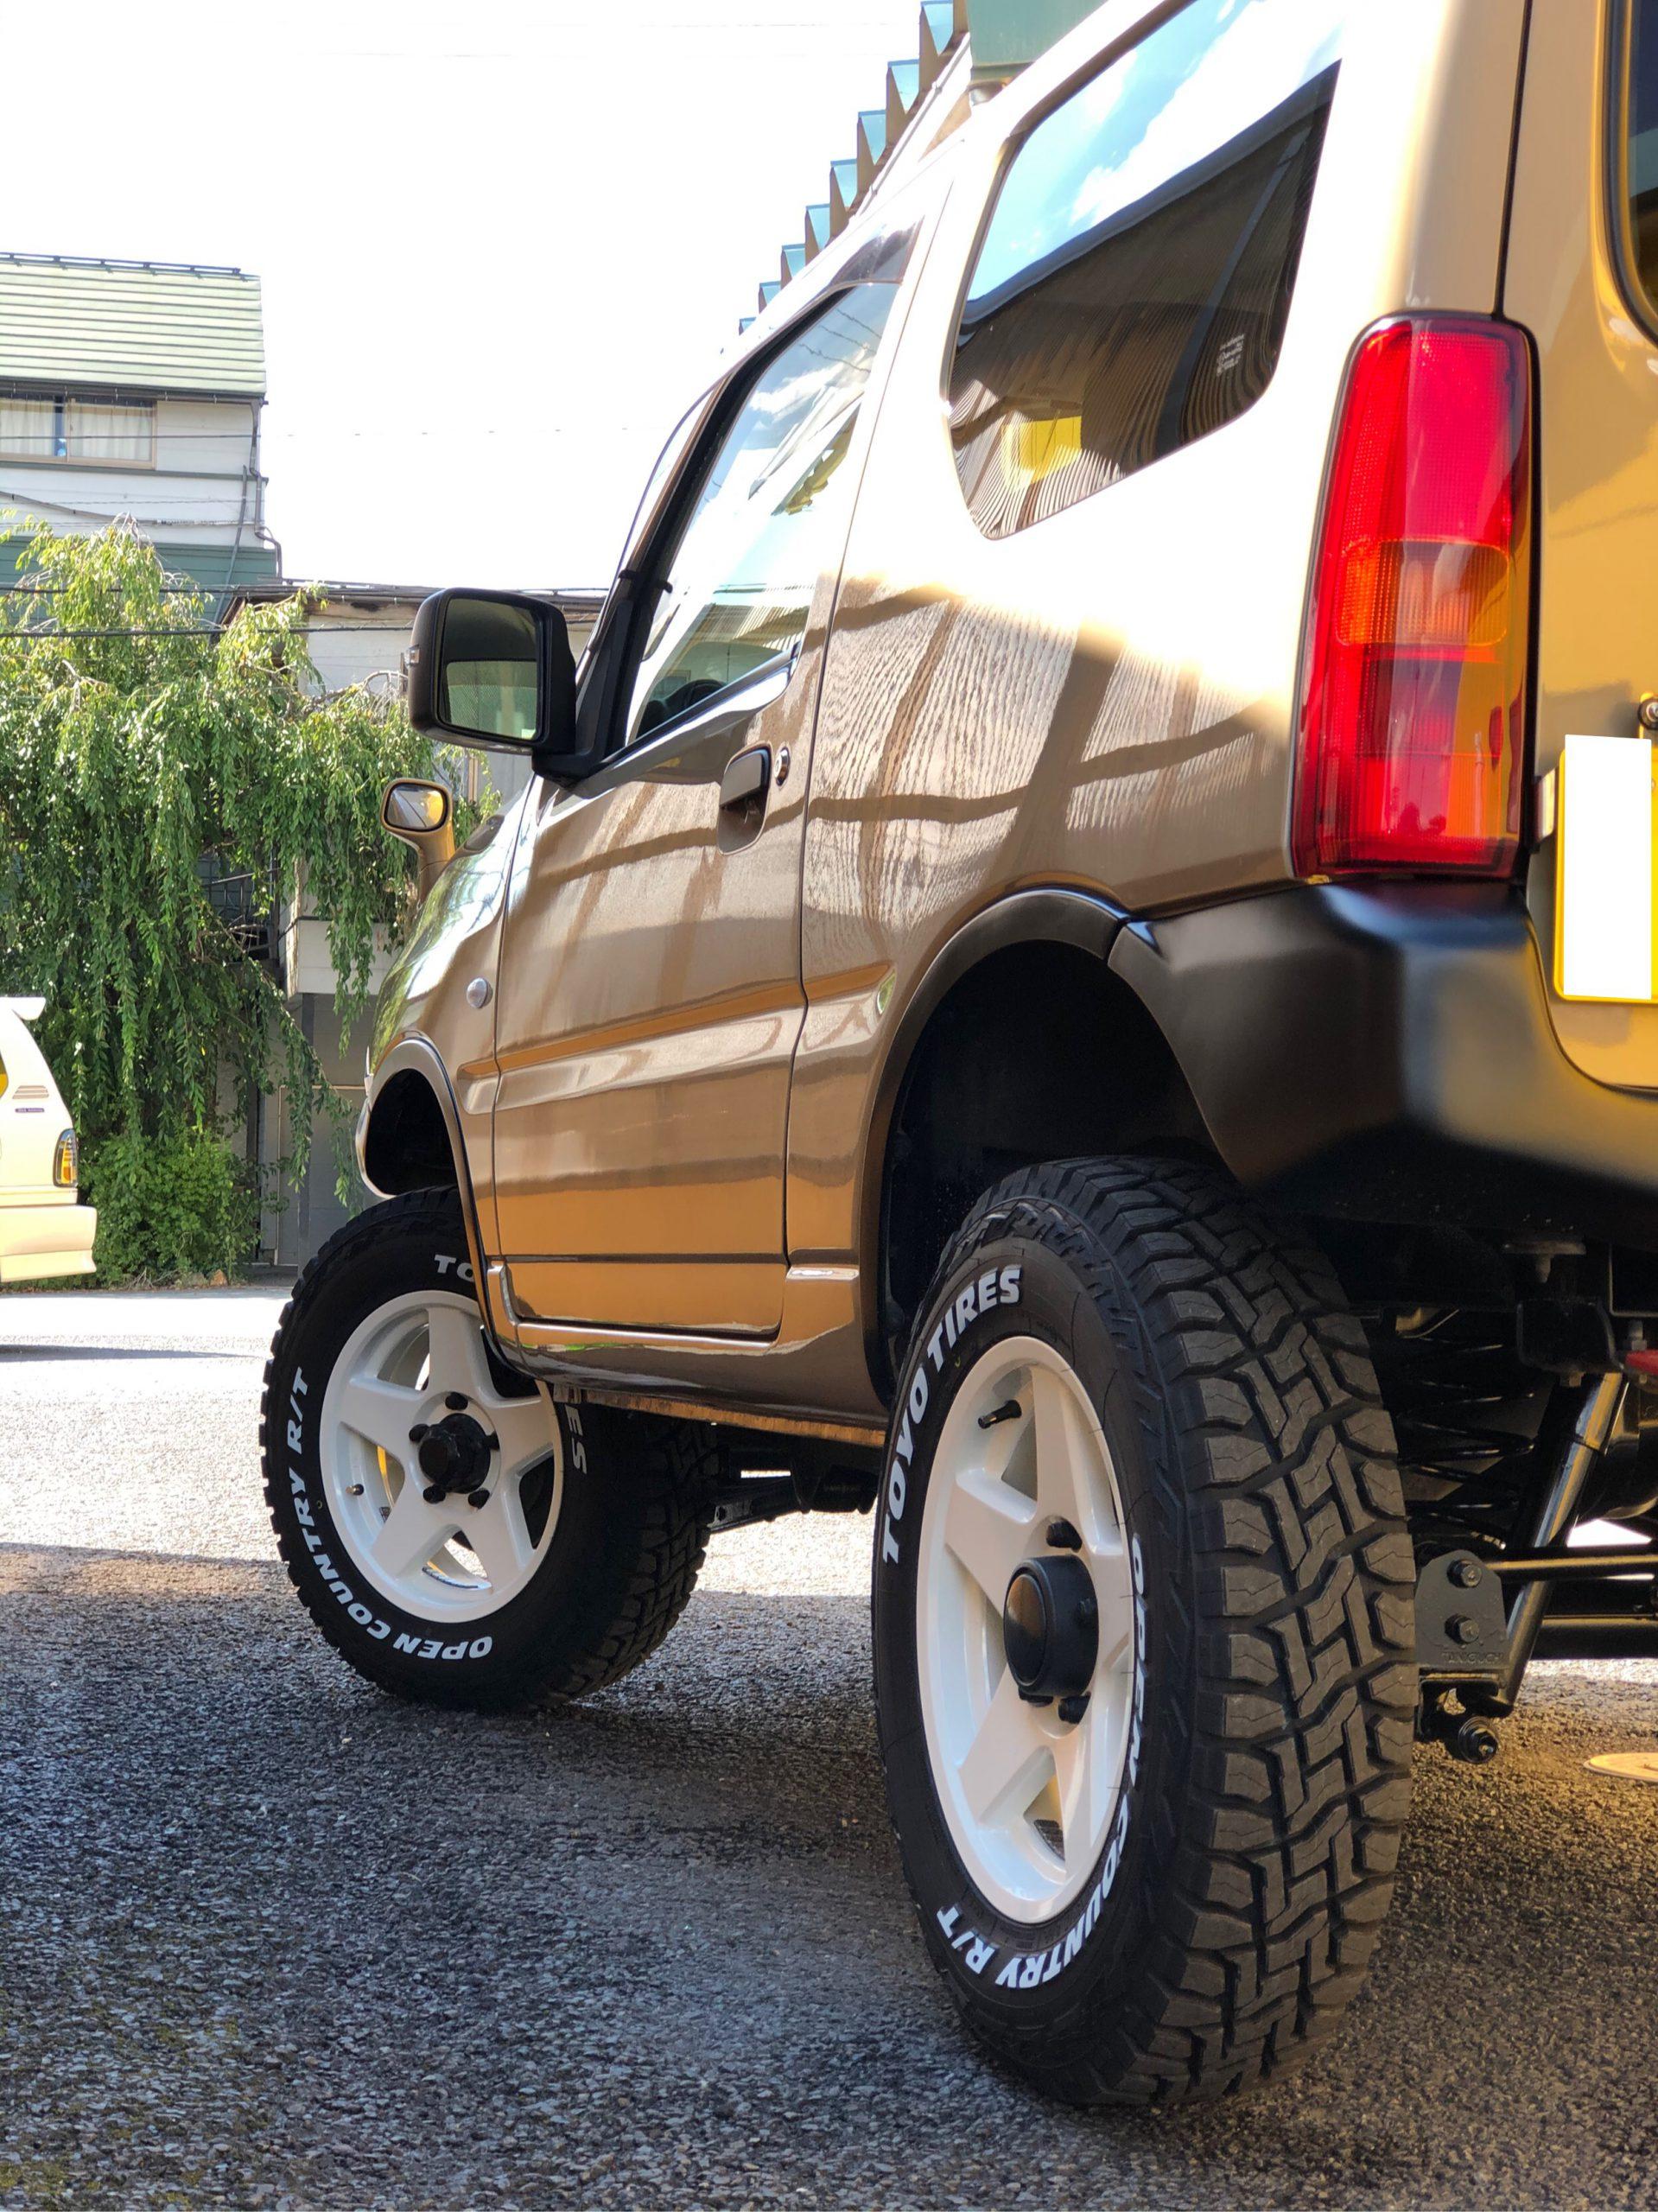 JB23ジムニー納車! ベージュ塗装 リフトアップ タイヤホイール交換